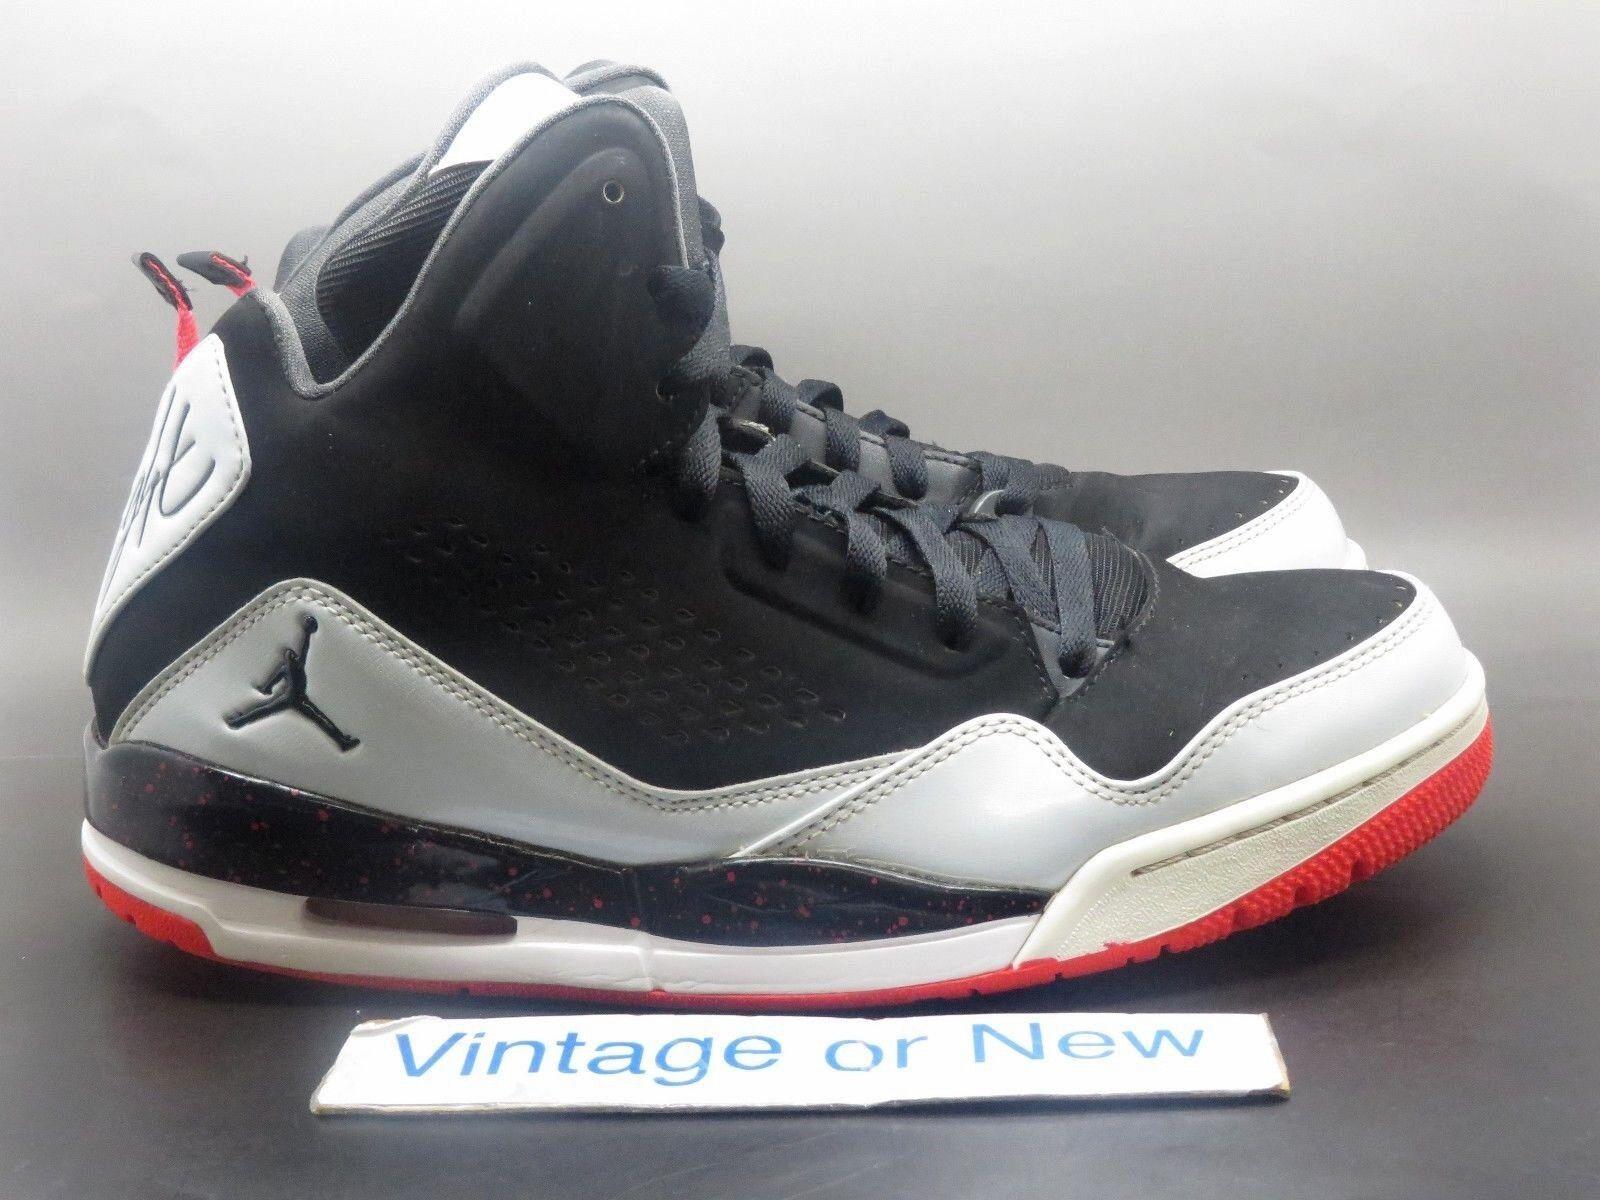 Nike Air Jordan SC-3 Black Pure Platinum Anthracite 2014 sz 10